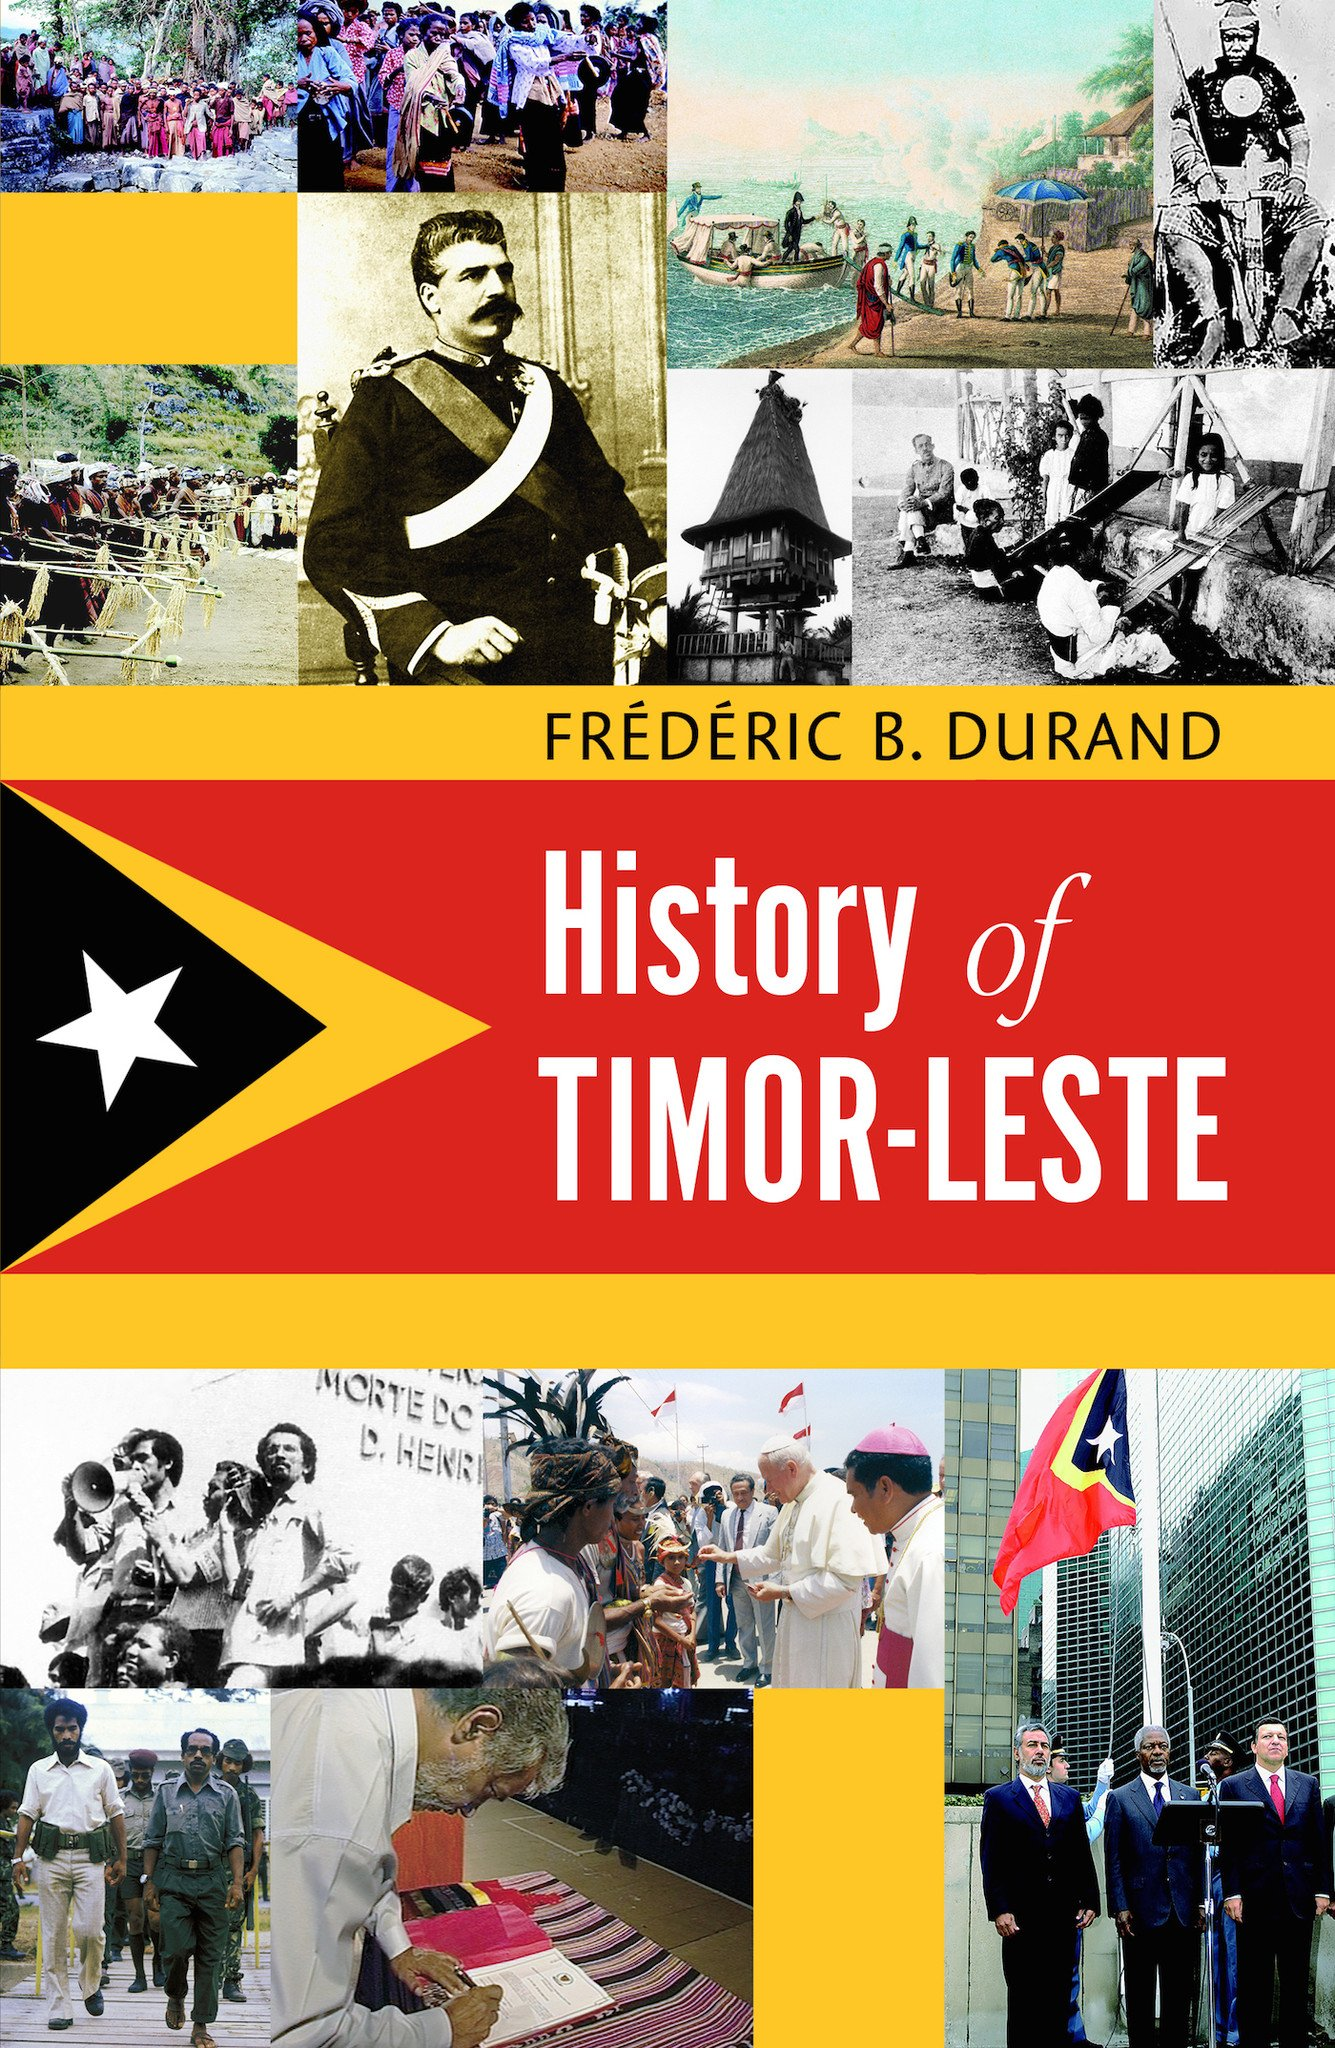 HISTORY OF TIMOR-LESTE Frédéric B. Durand